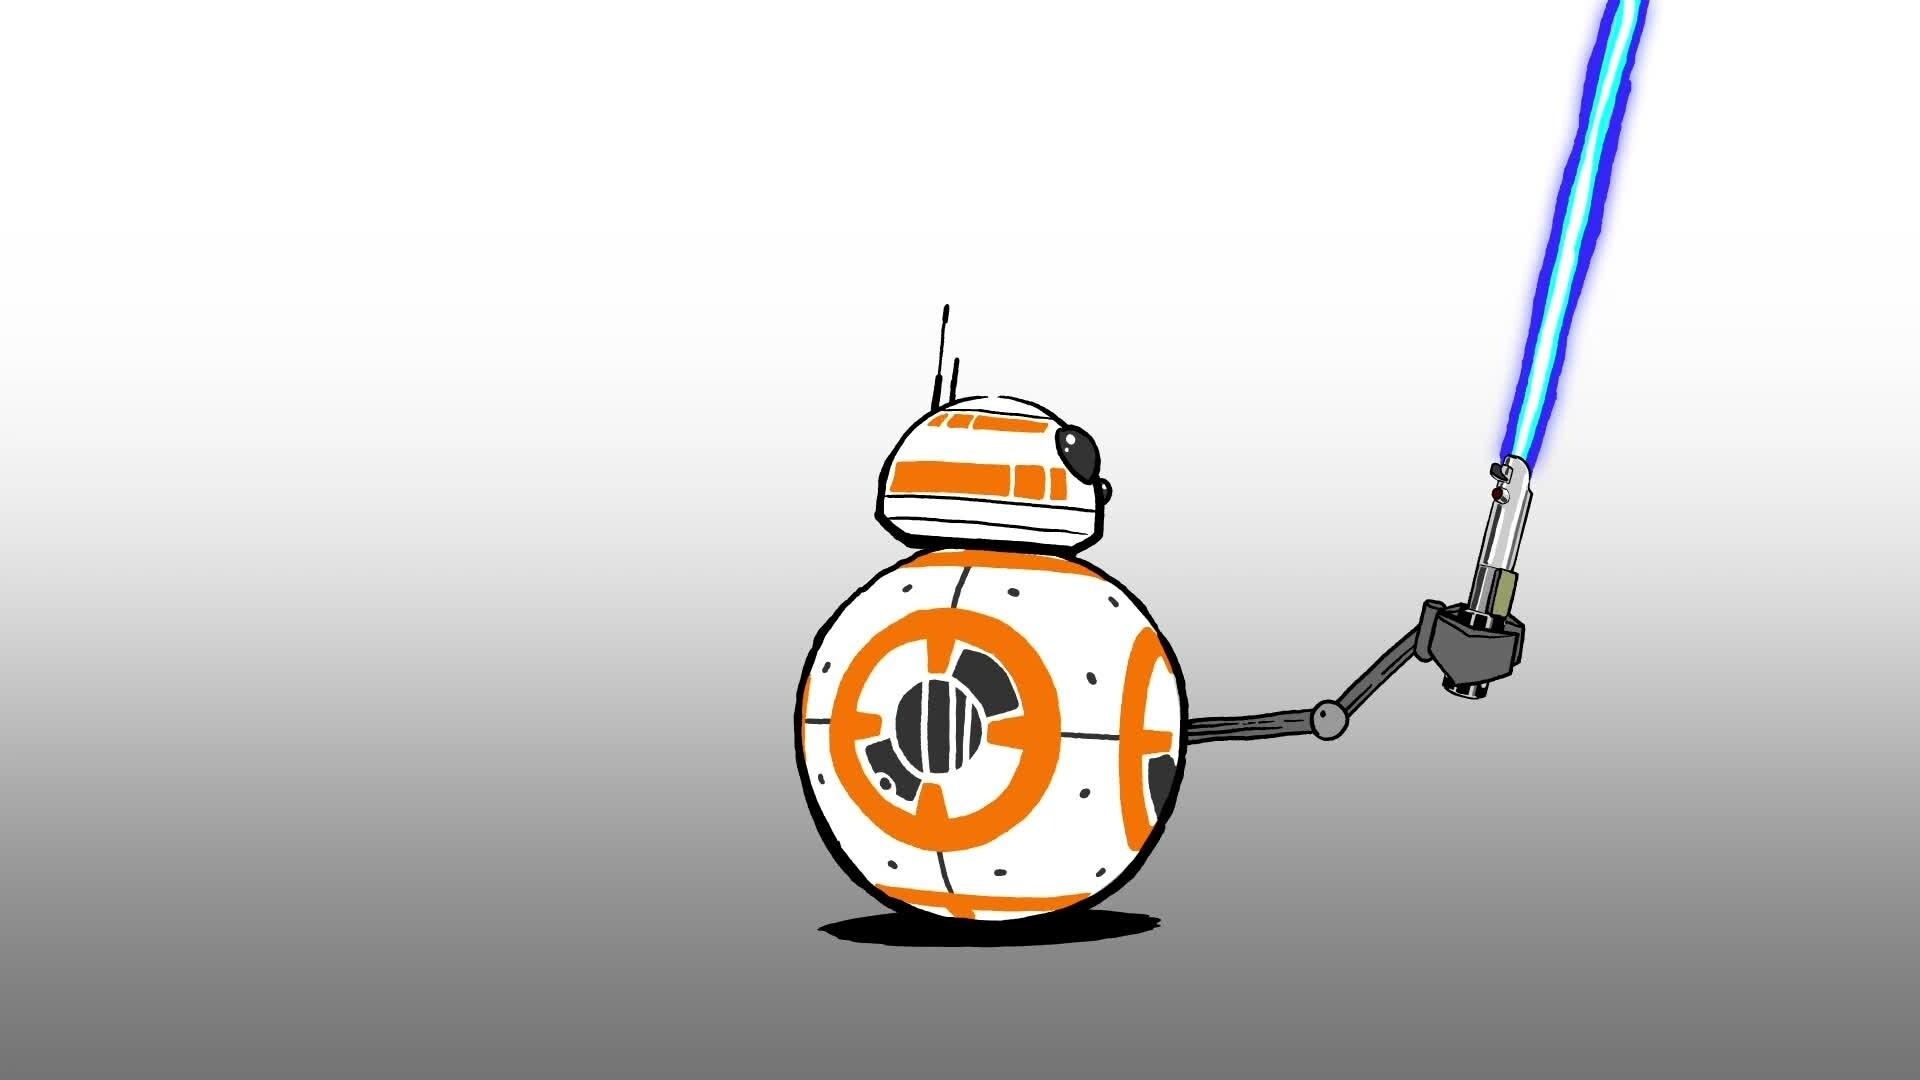 Star Wars : La Pause BB-8 - Le sabre-laser